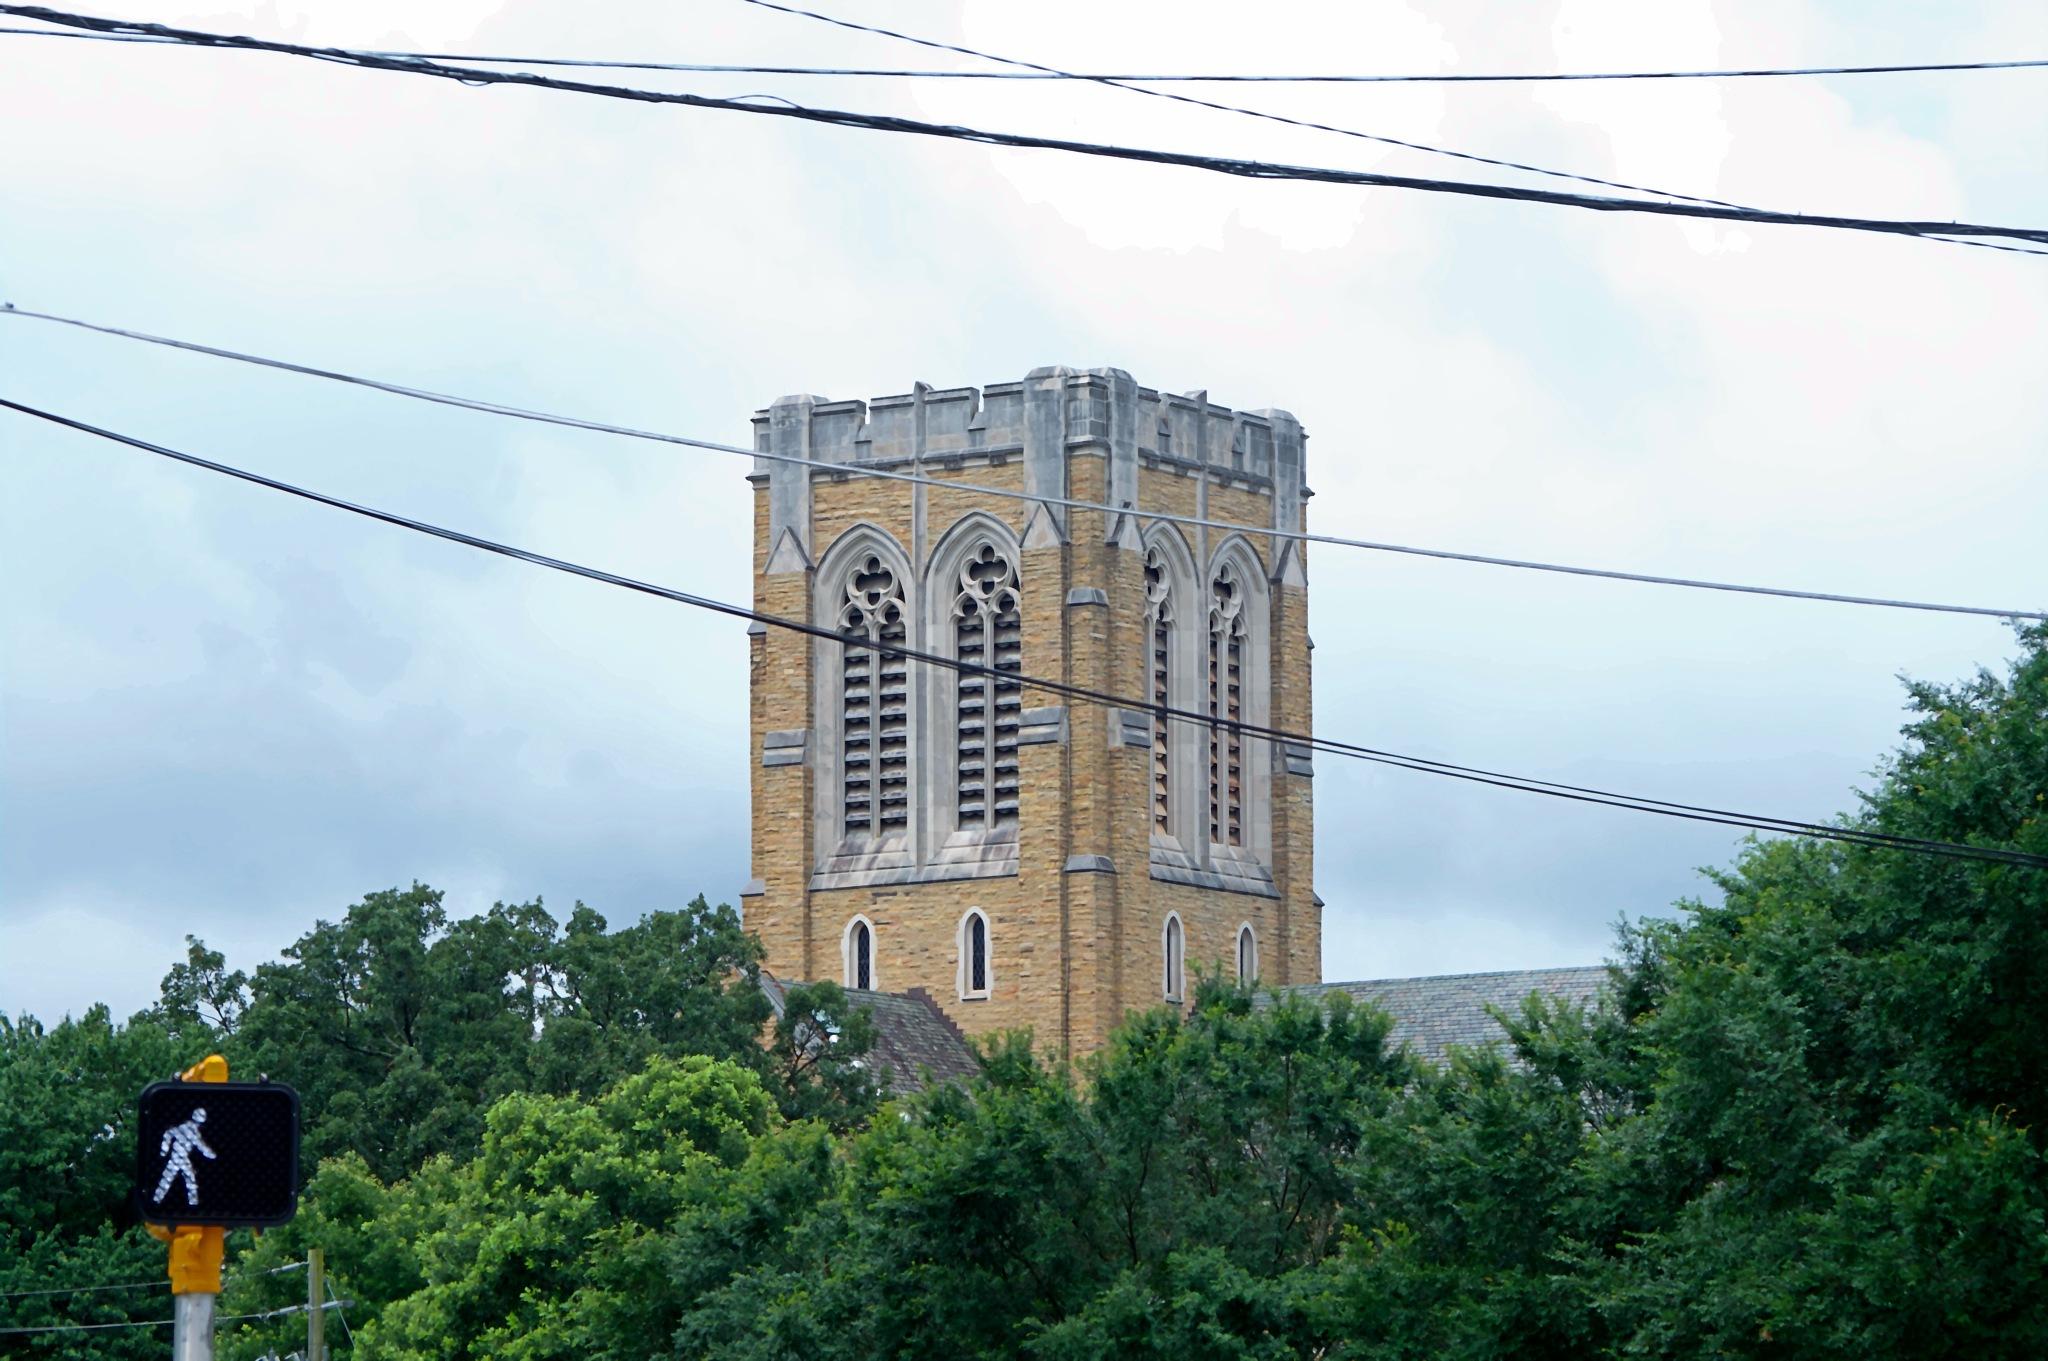 Church bldg in Atlanta by Joey Fernandez